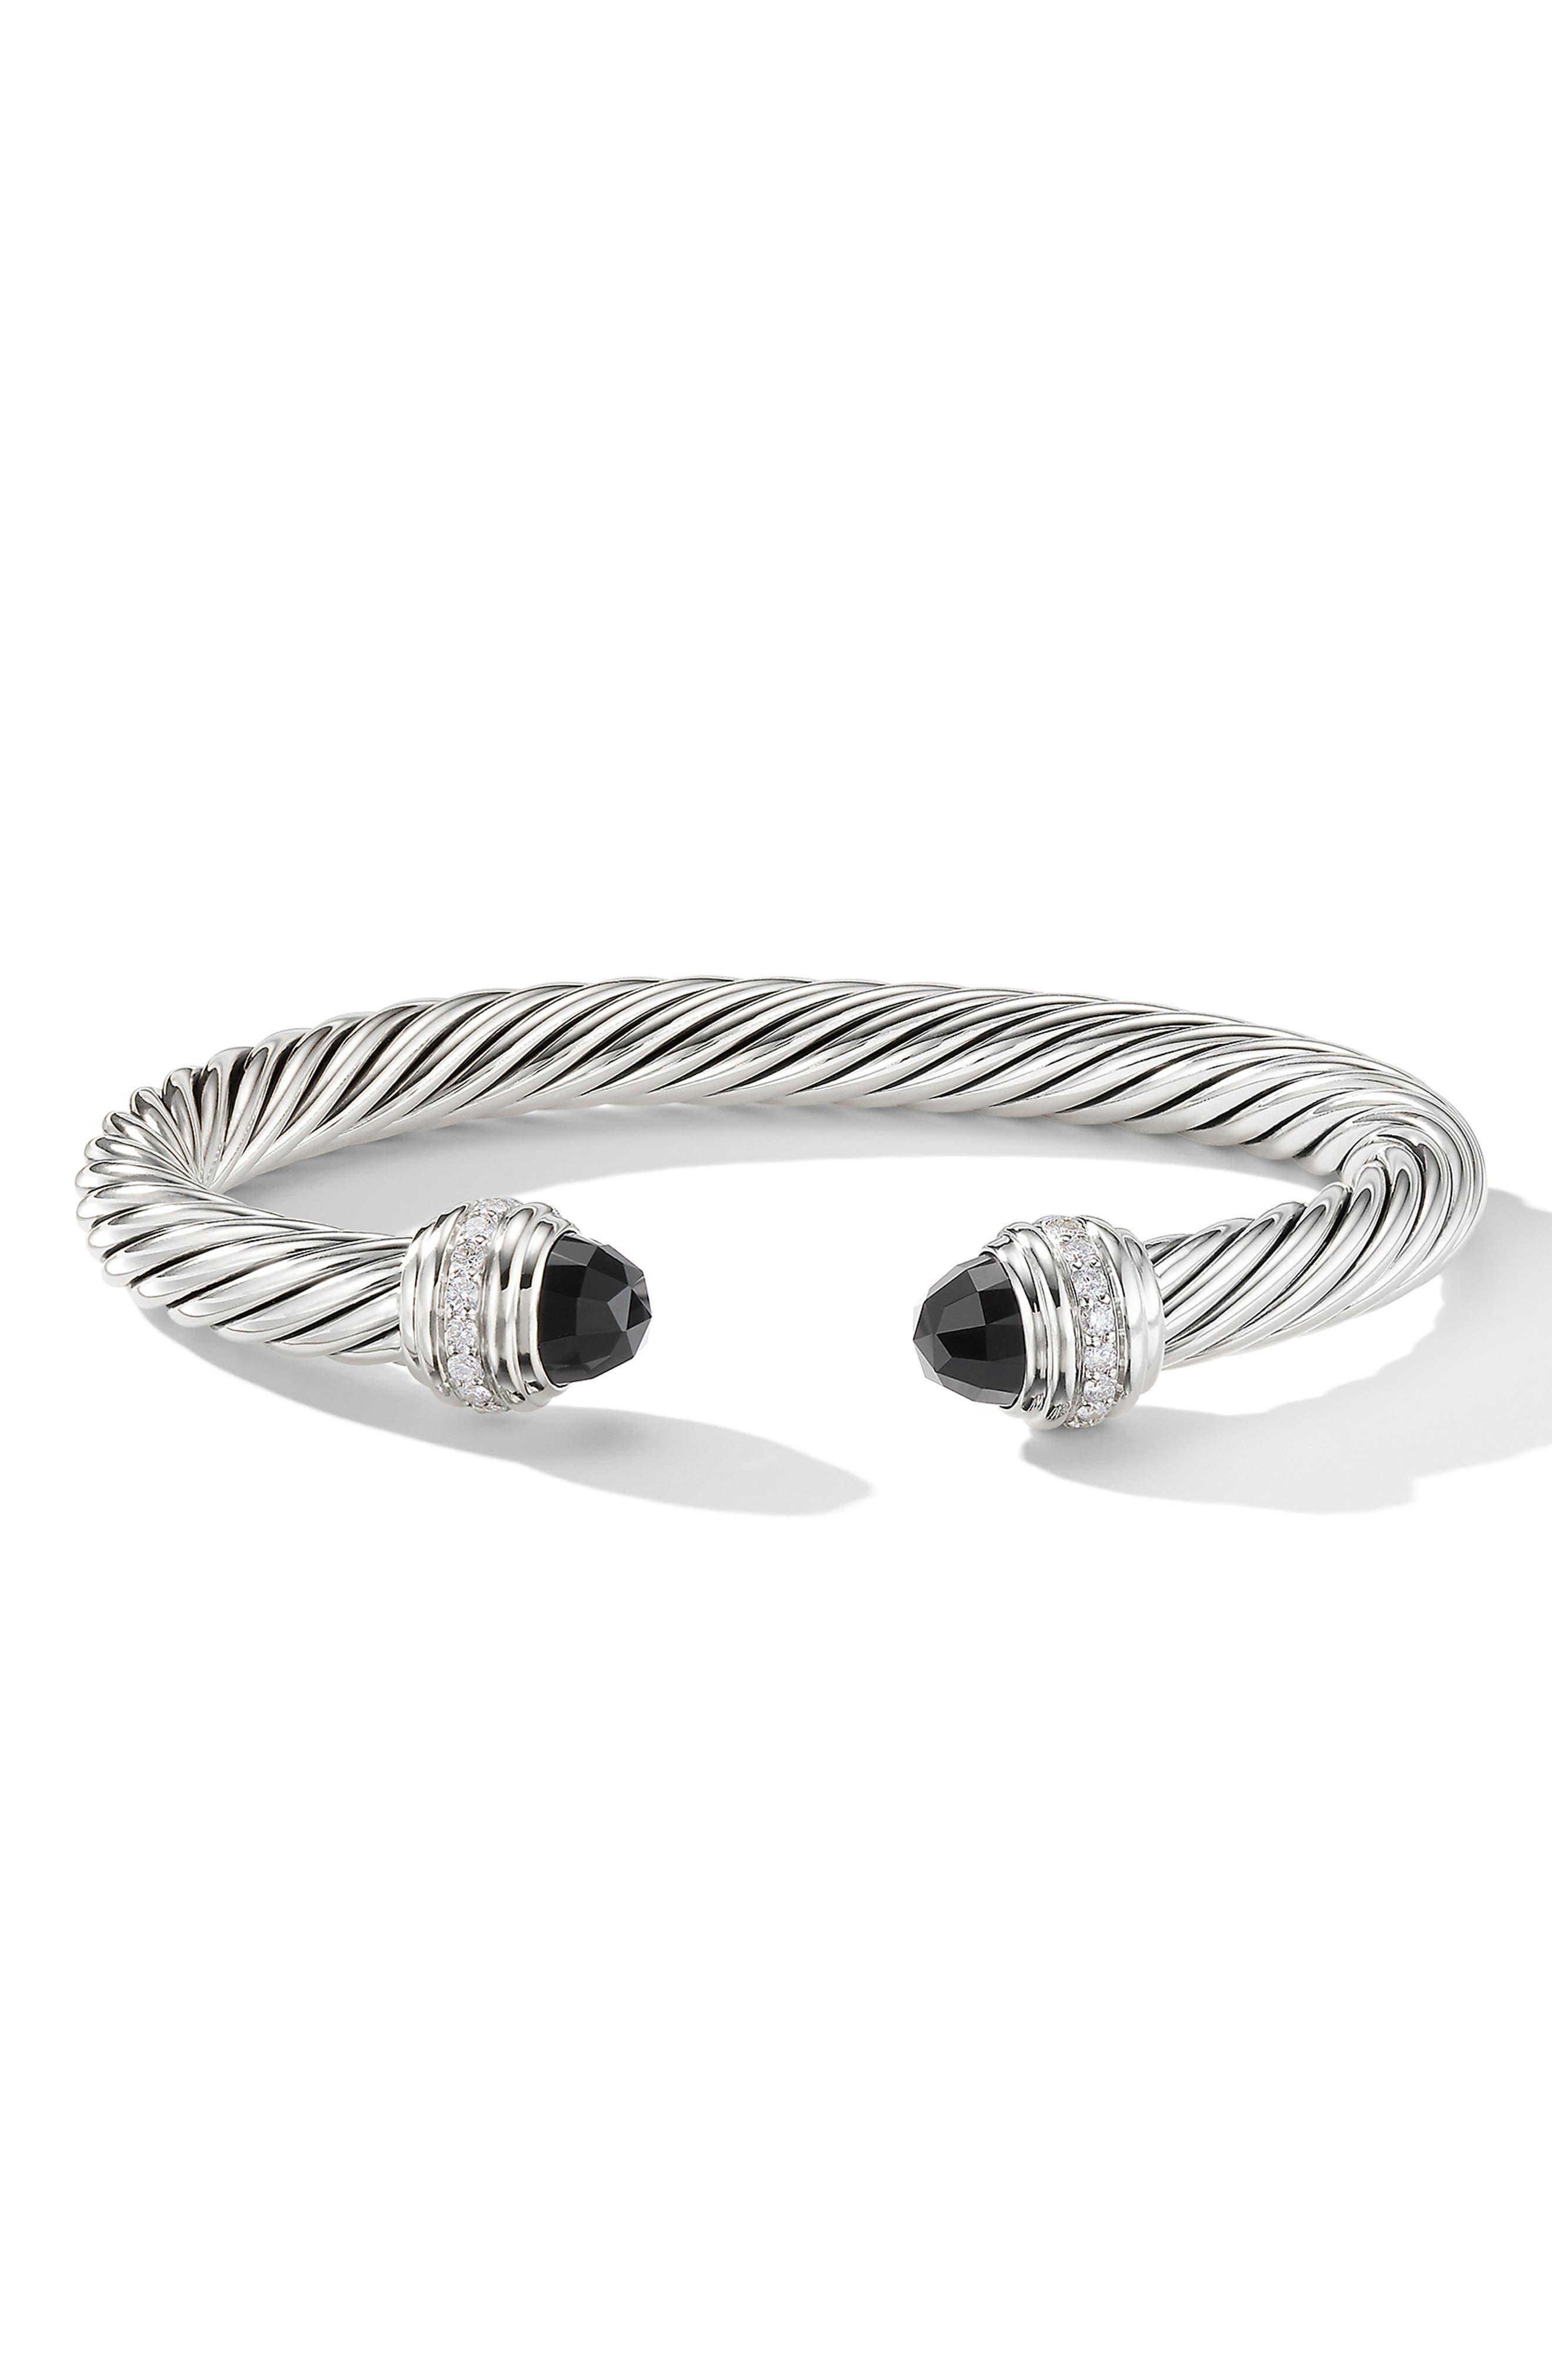 DAVID YURMAN, Cable Classics Bracelet with Semiprecious Stones & Diamonds, 7mm, Alternate thumbnail 2, color, SILVER/ DIAMOND/ BLACK ONYX